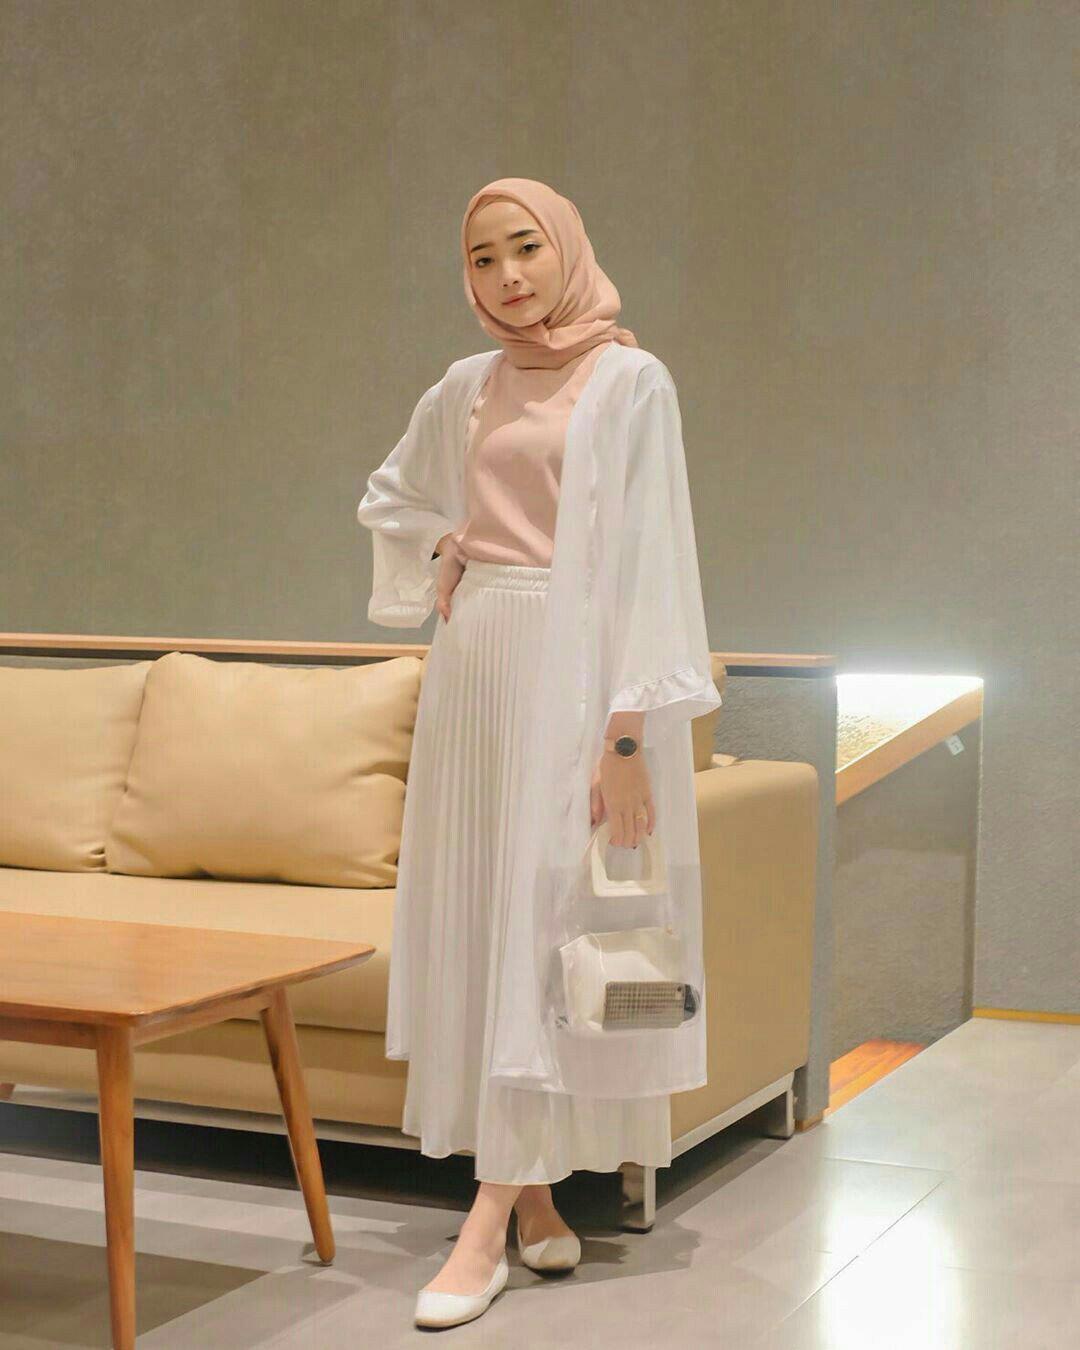 Hope For Life هــیـوایـەکـــ بـۆ ژیــانـــ Di 2021 Inspirasi Fashion Hijab Hijab Chic Casual Hijab Outfit